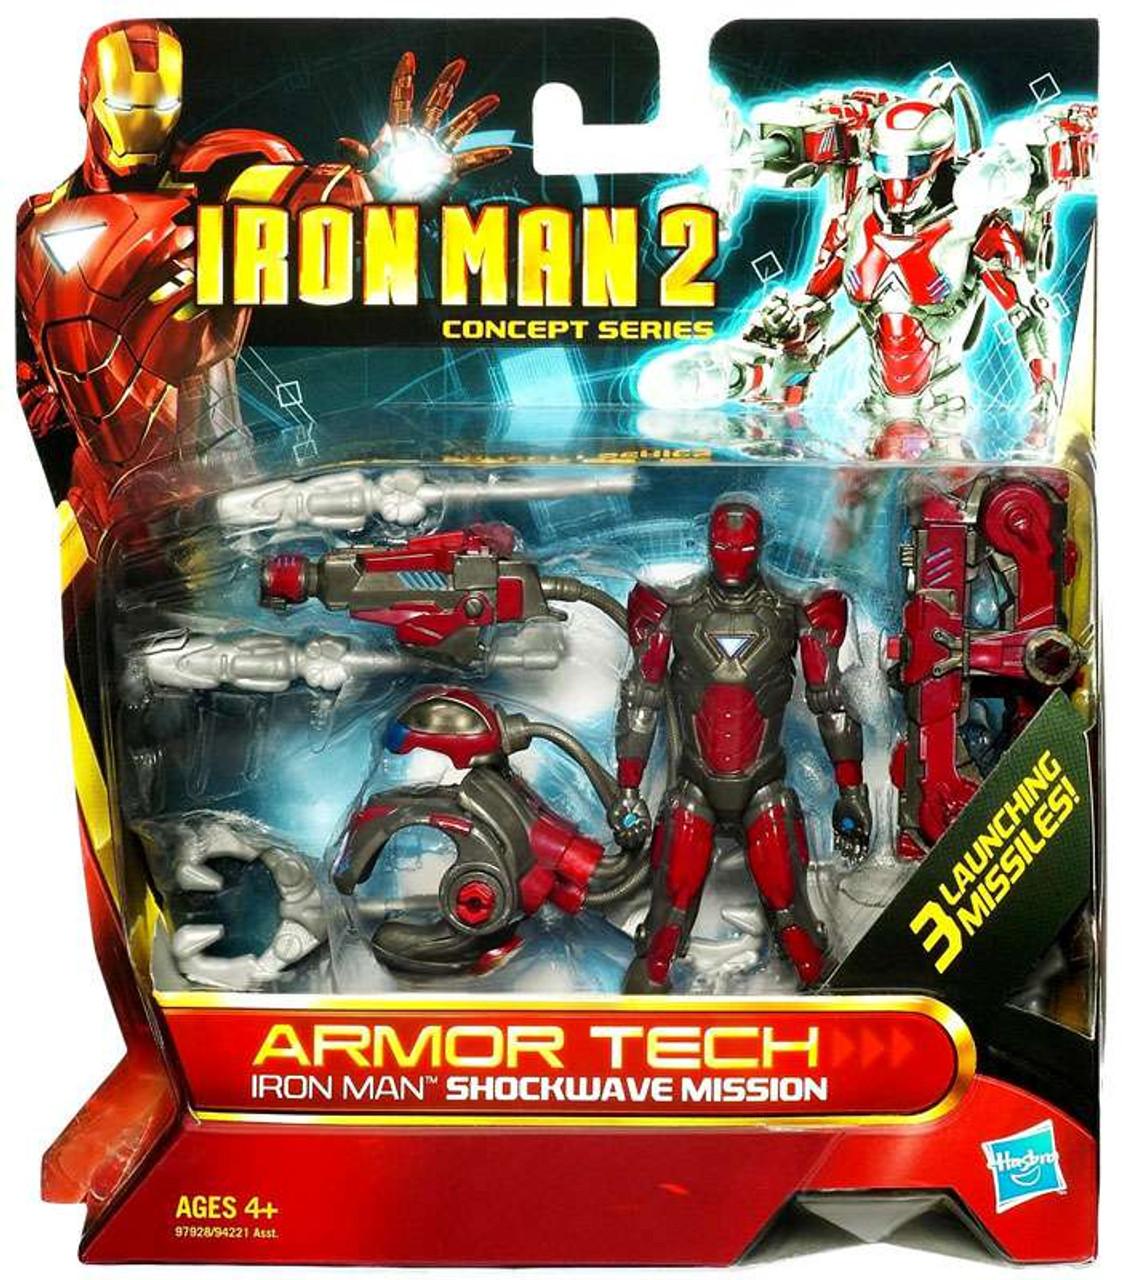 Iron Man 2 Concept Series Armor Tech Iron Man Shockwave Mission Action Figure